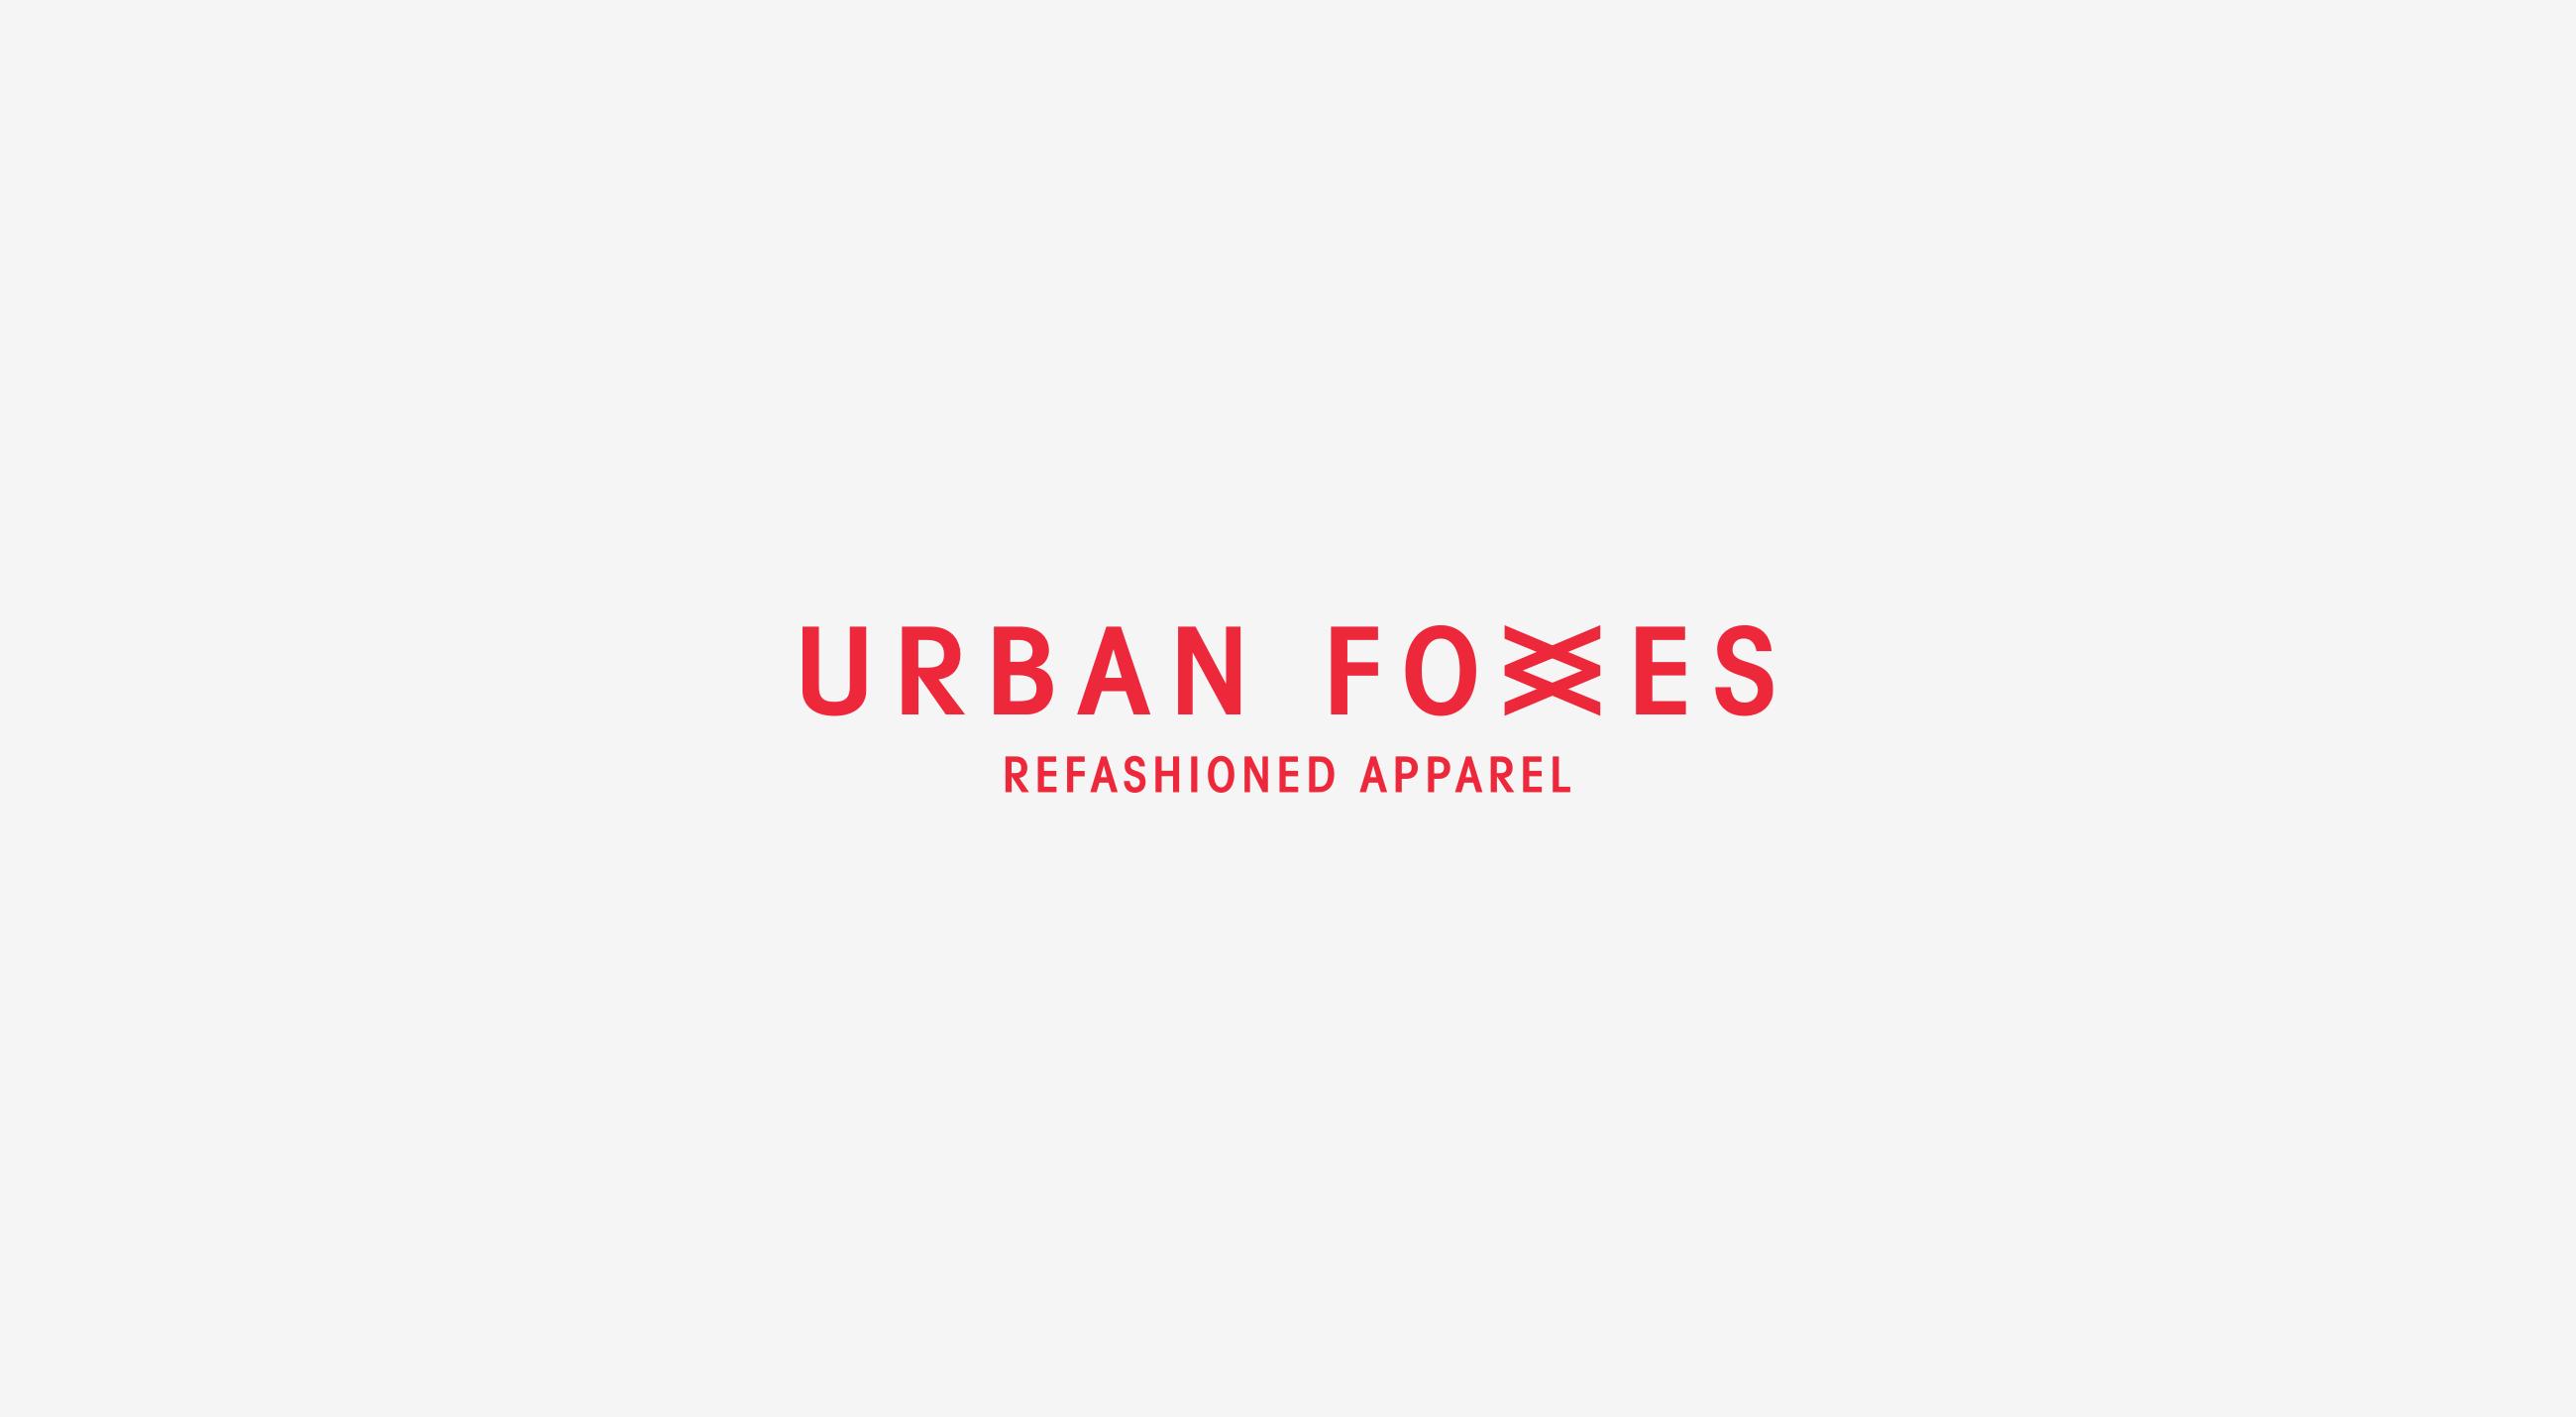 Urban Foxxes logo